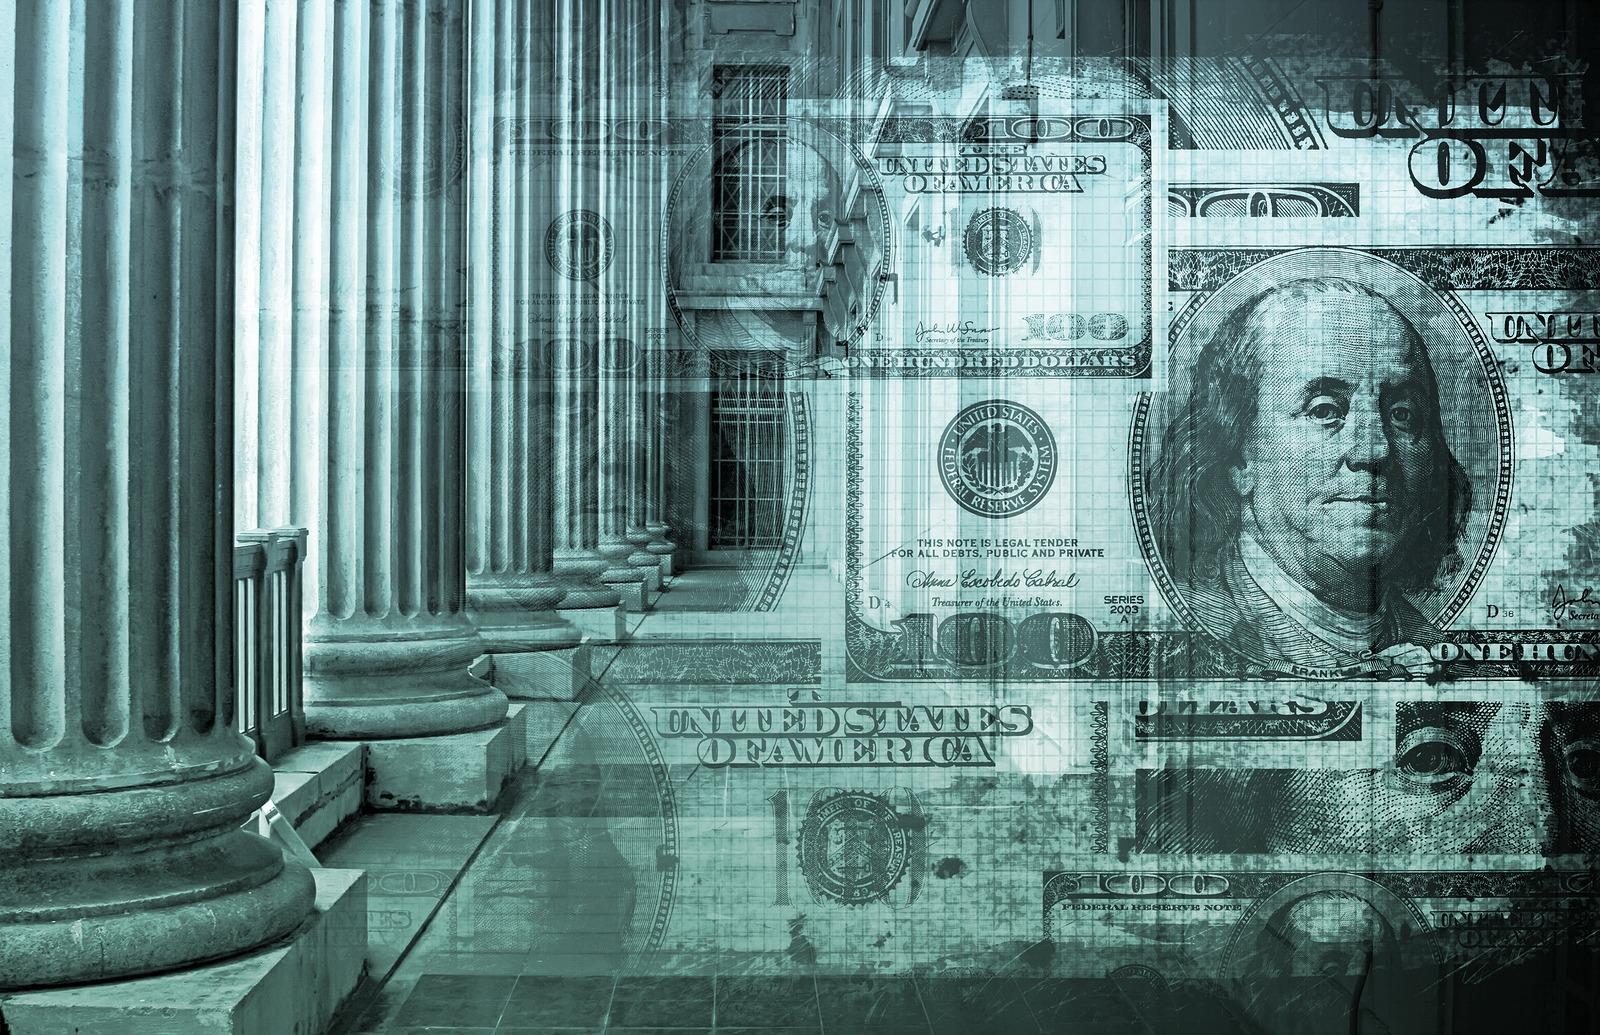 Small Business Financing - Consider Online Lending Opportunities